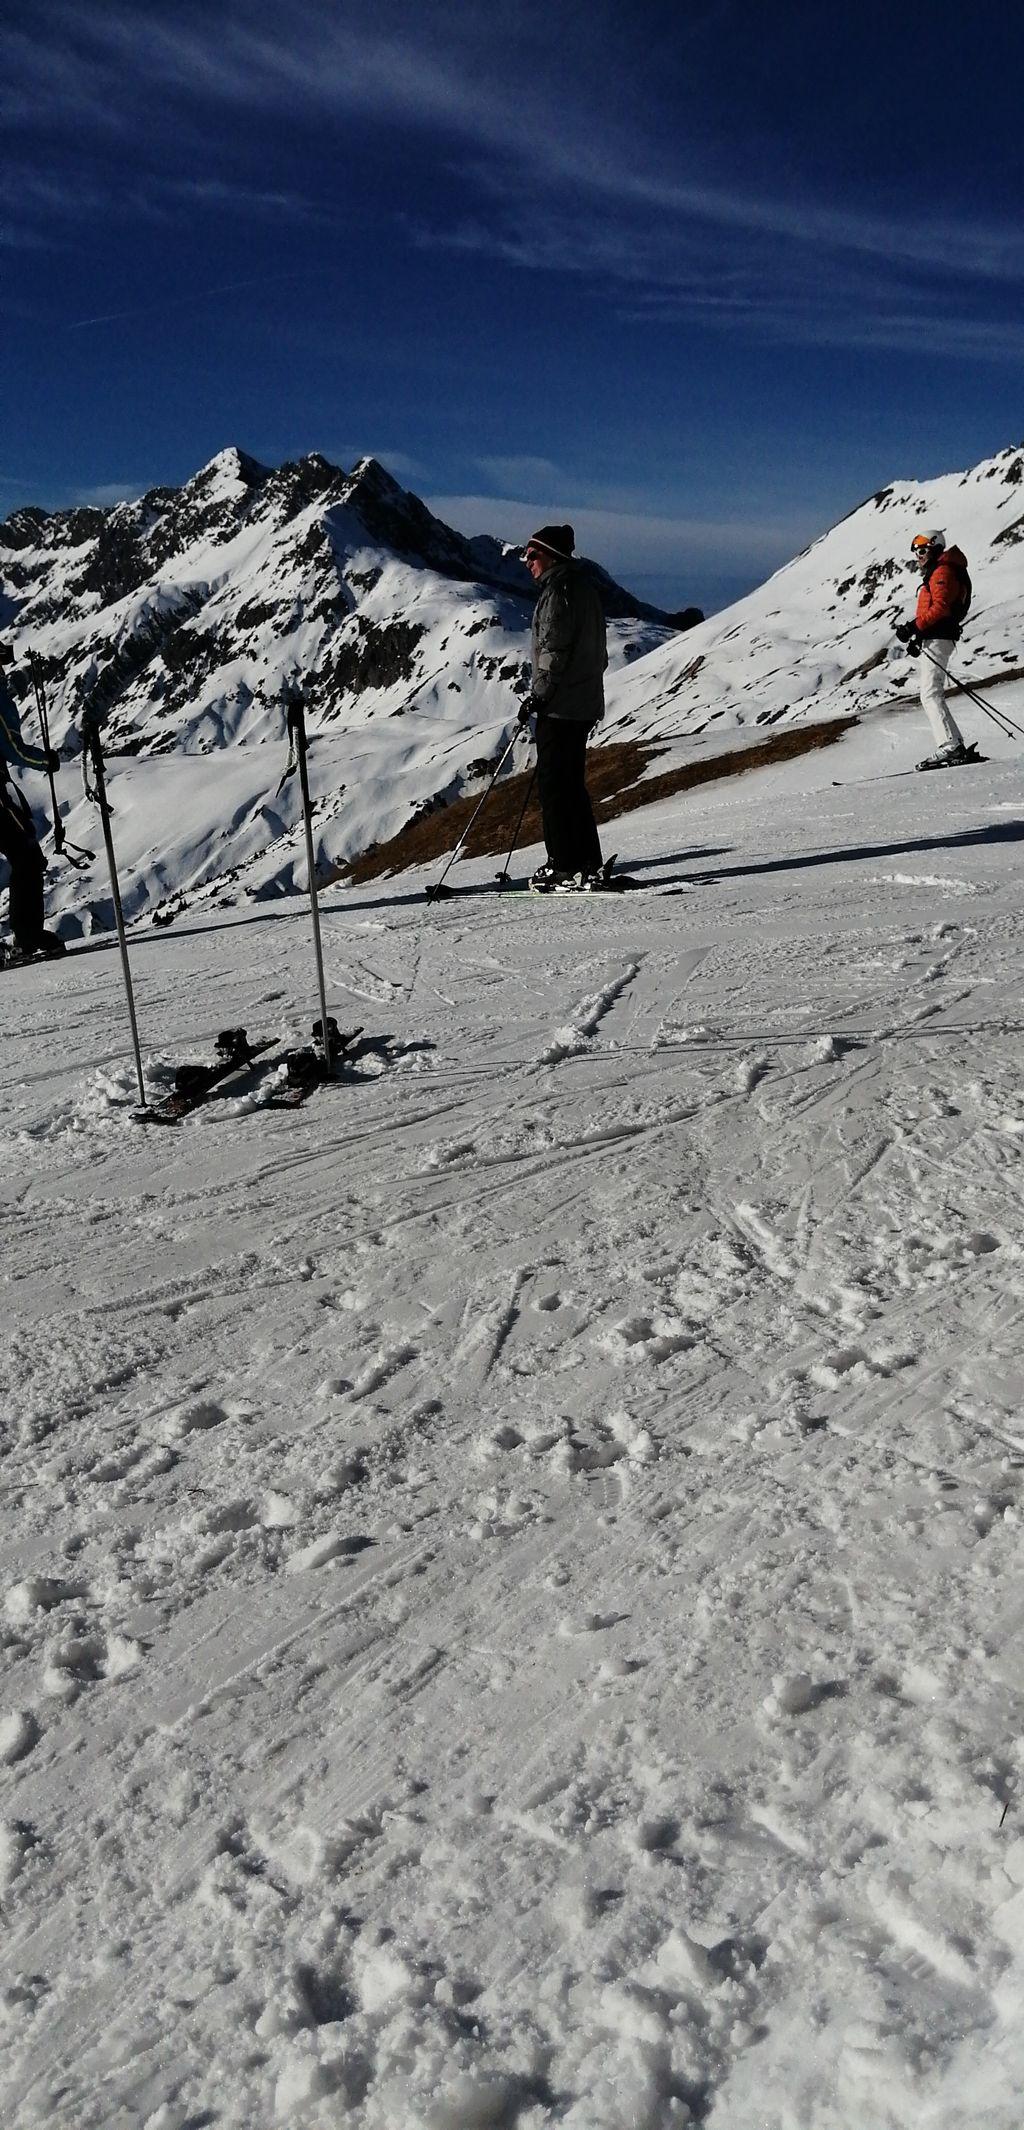 https://cdn.wintersport.nl/forum/26/0c775ef6389d50ed20dbb607...